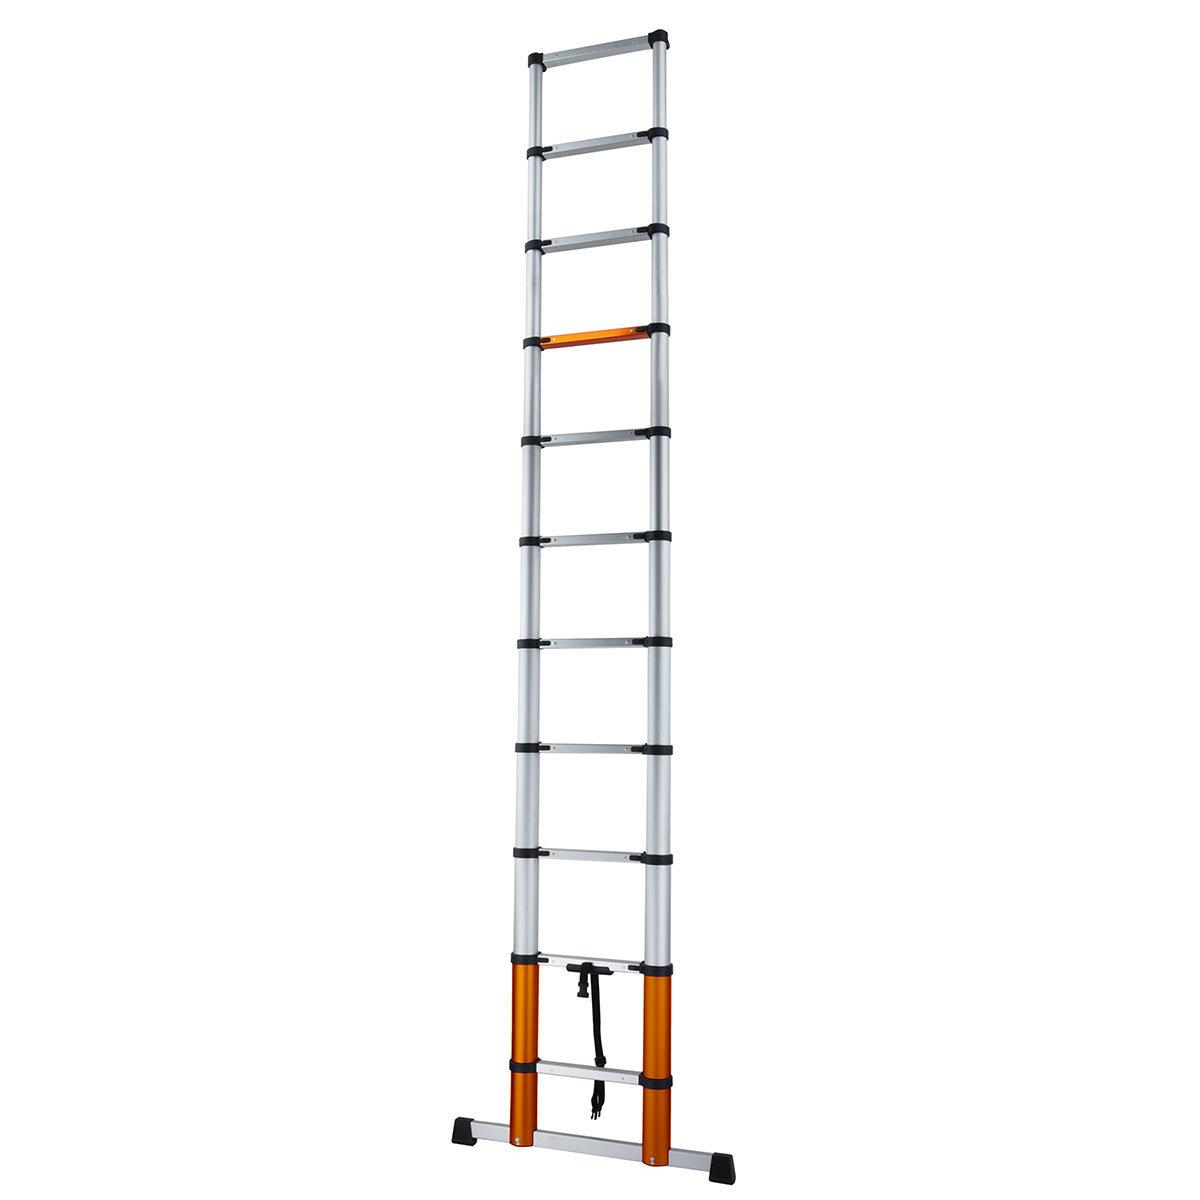 Teleskopleiter Giraffe Air 3,20 m mit Stand- & Quertraverse | #3